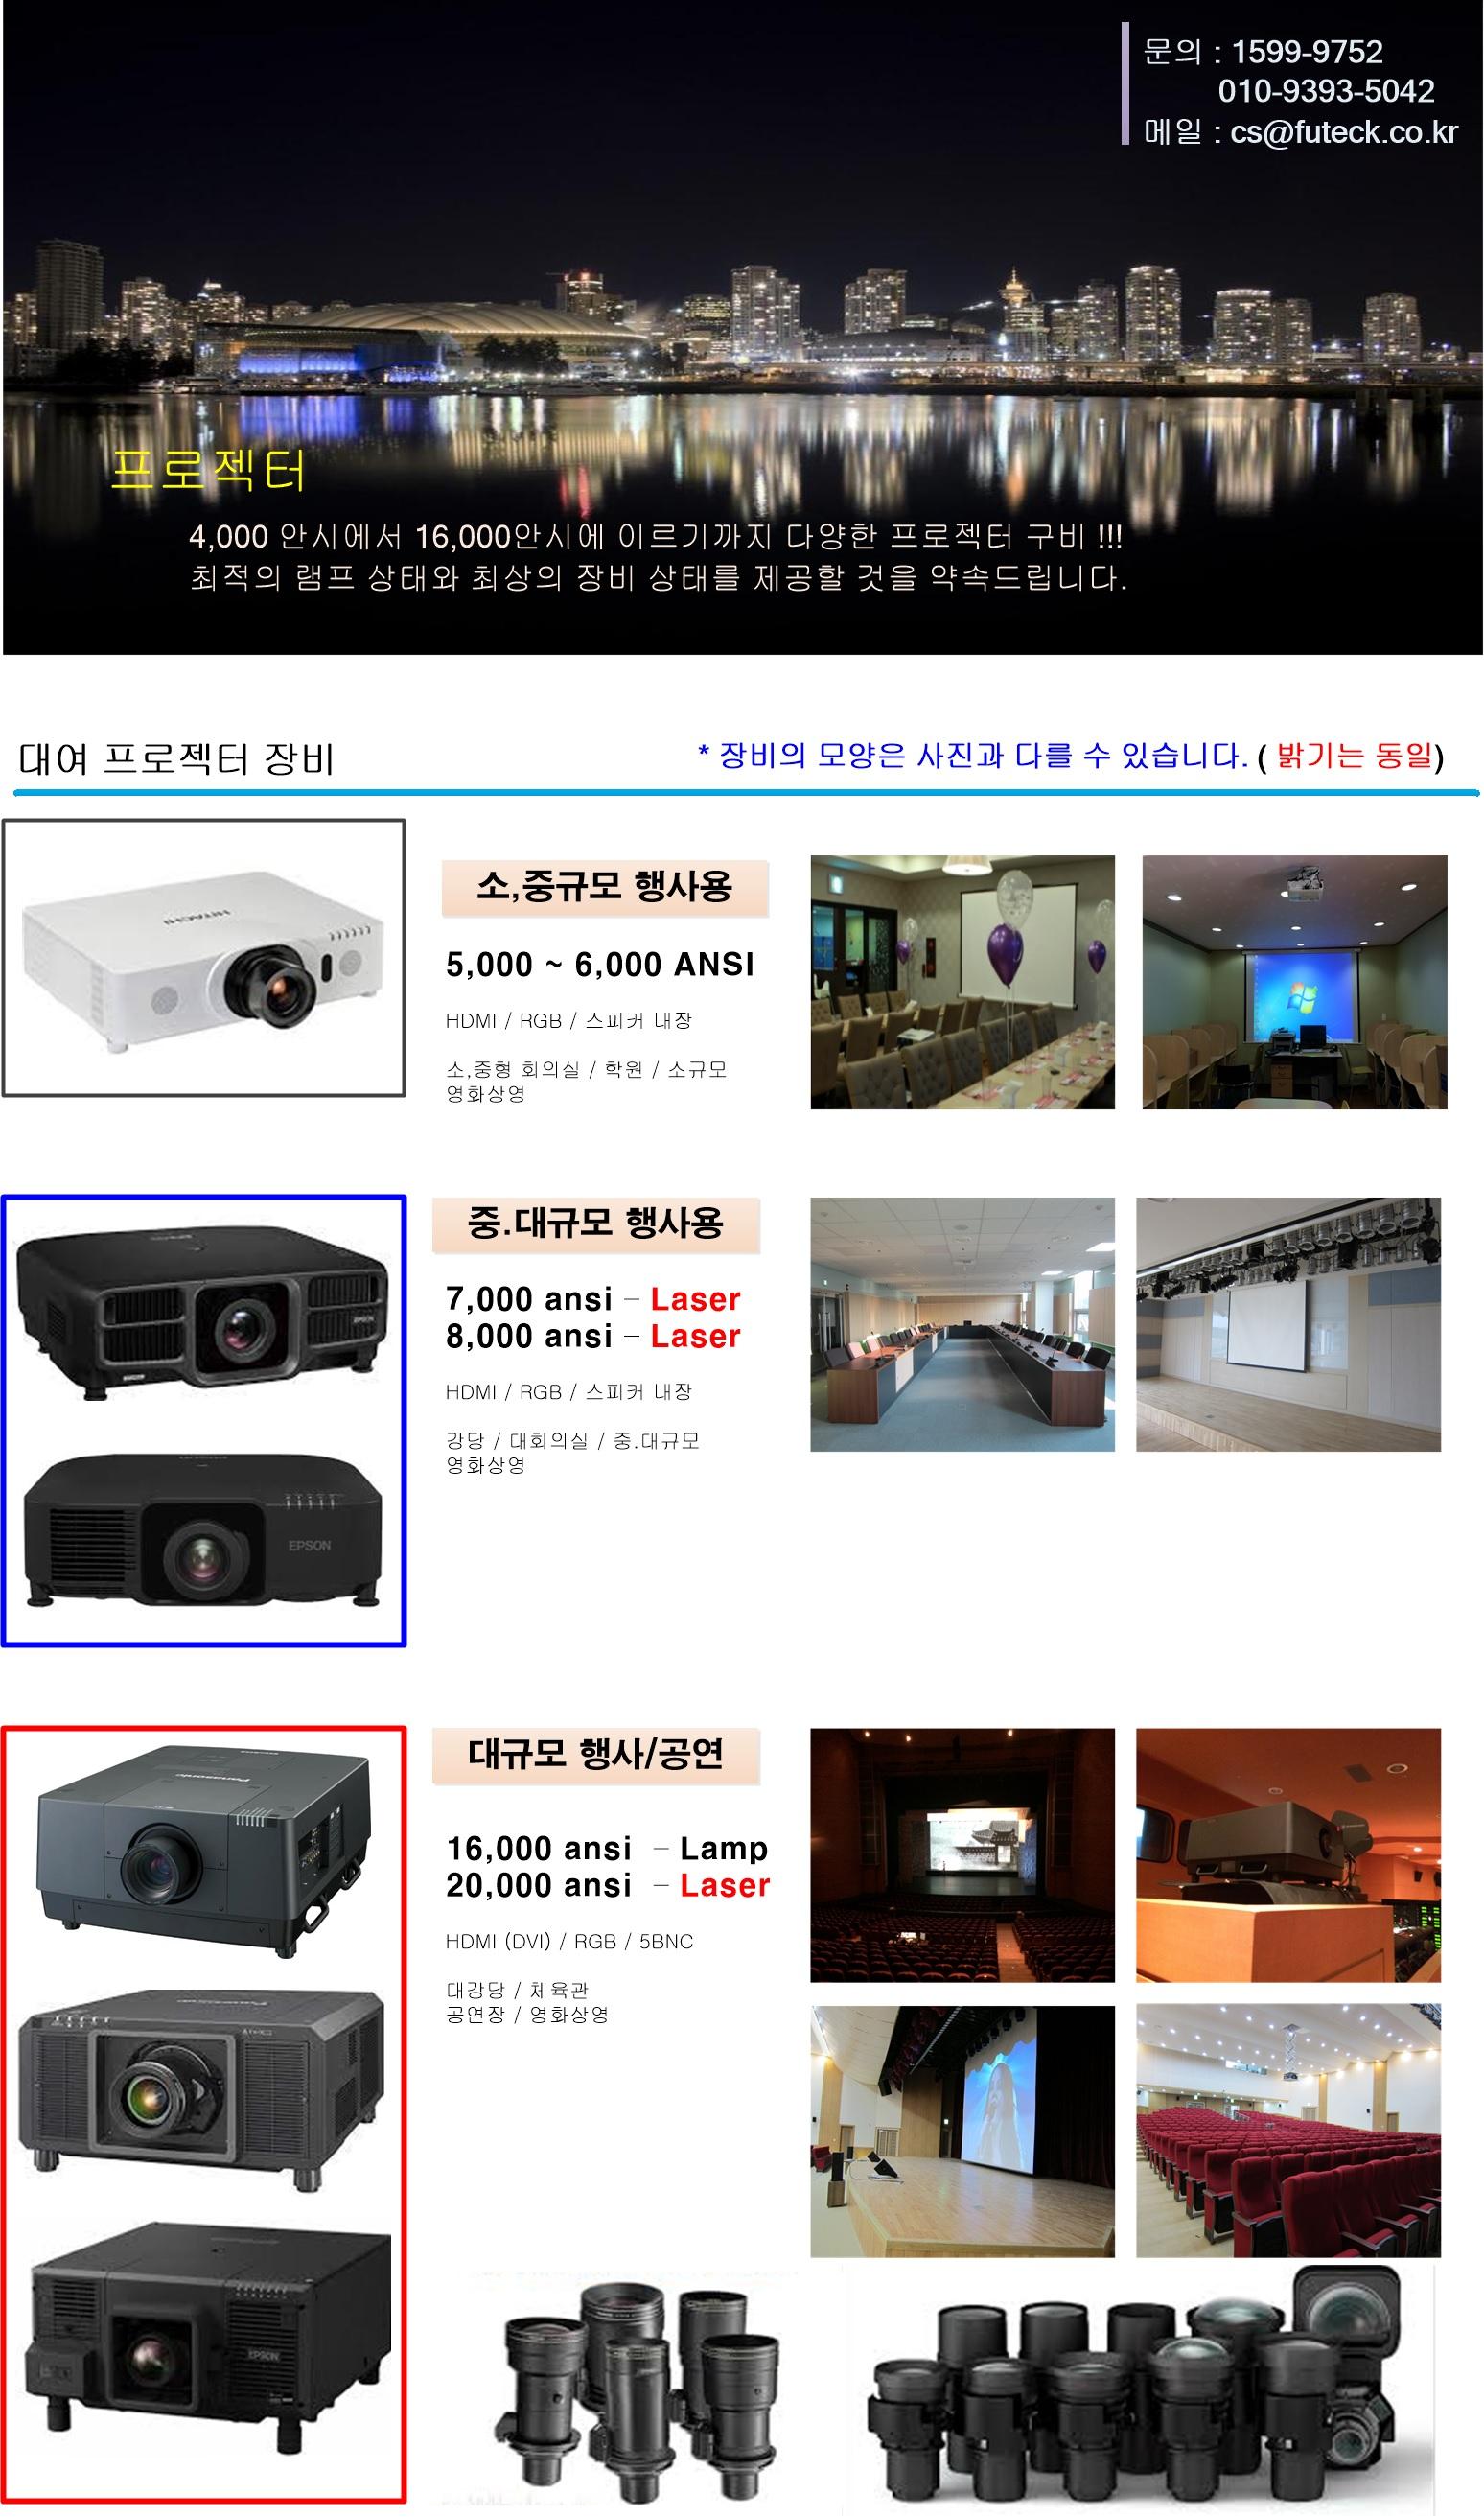 1. BD_Projector.jpg